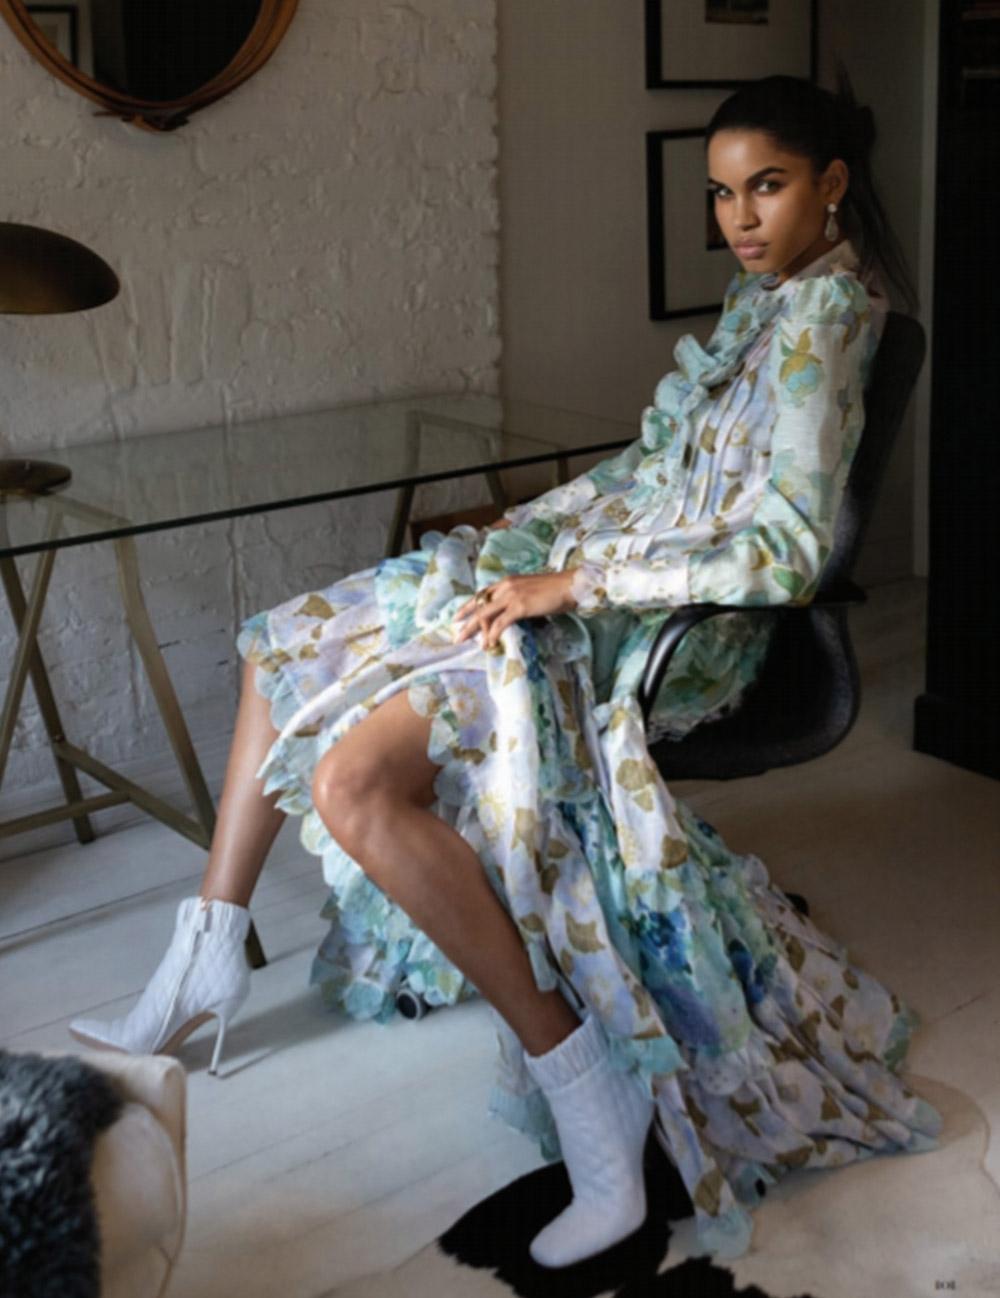 The Rhythm Scalloped Dress features in Harper's Bazaar Vietnam